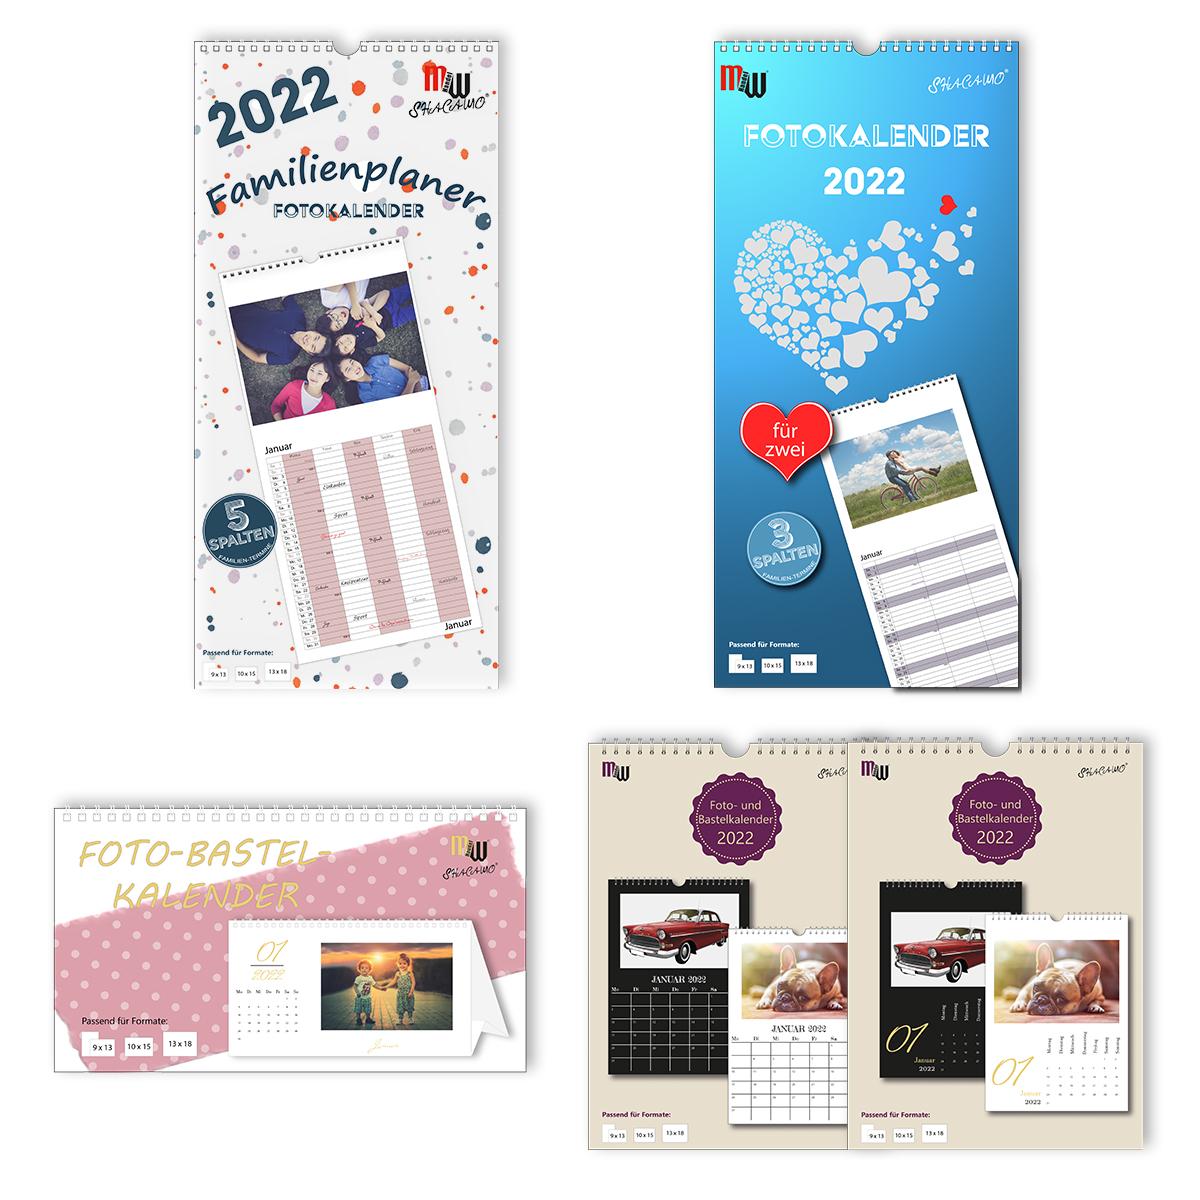 Sortimentskarton Kalender 2022 zum Selbergestalten Image